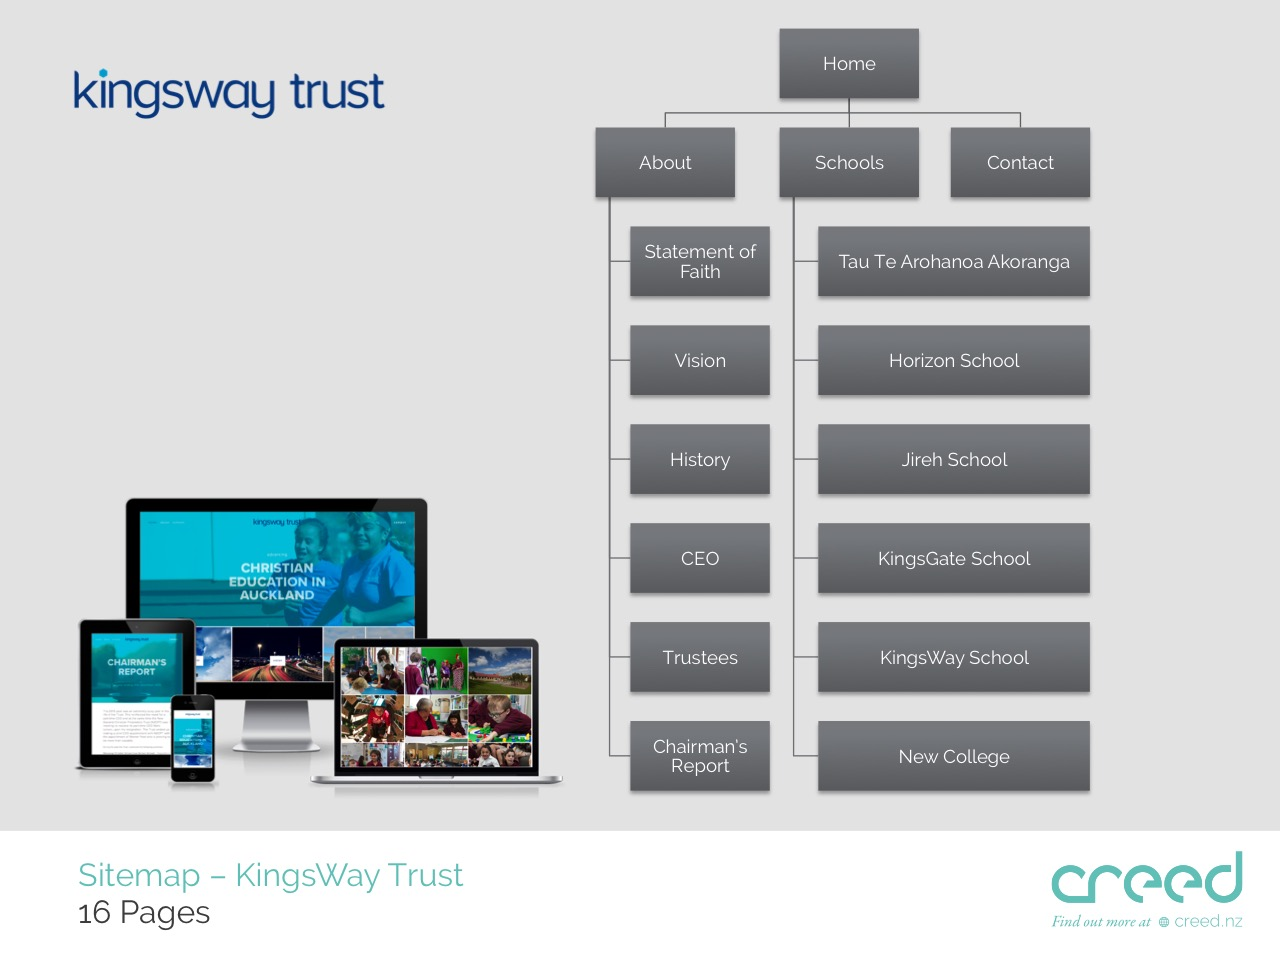 KingsWay Trust